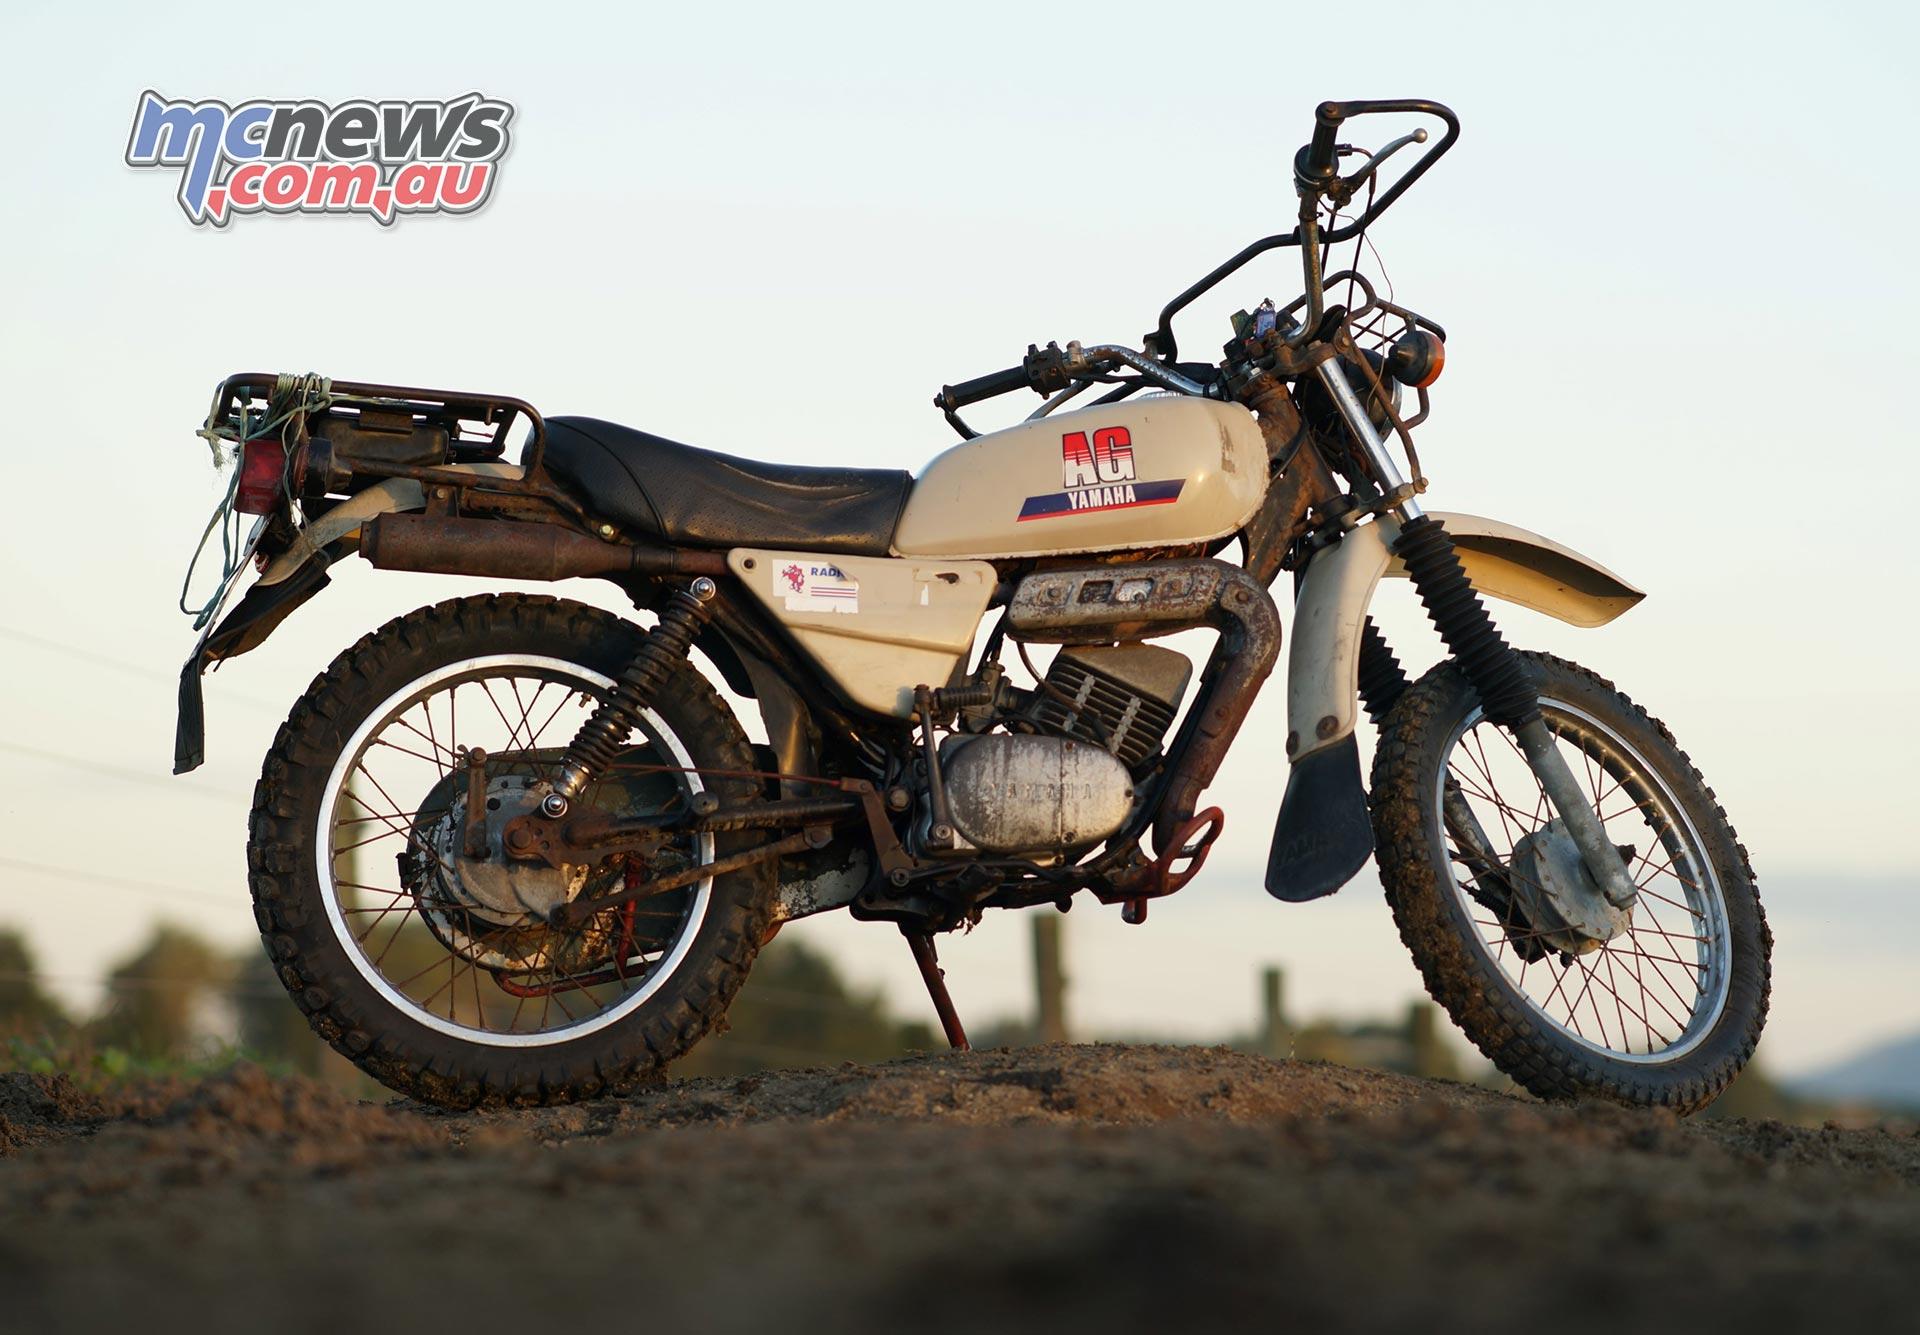 yamaha ag legend back better than ever 3499 mcnews com au rh mcnews com au Yamaha Motorcycle Fuel Pump New Yamaha Xmax Scooters Motorcycles